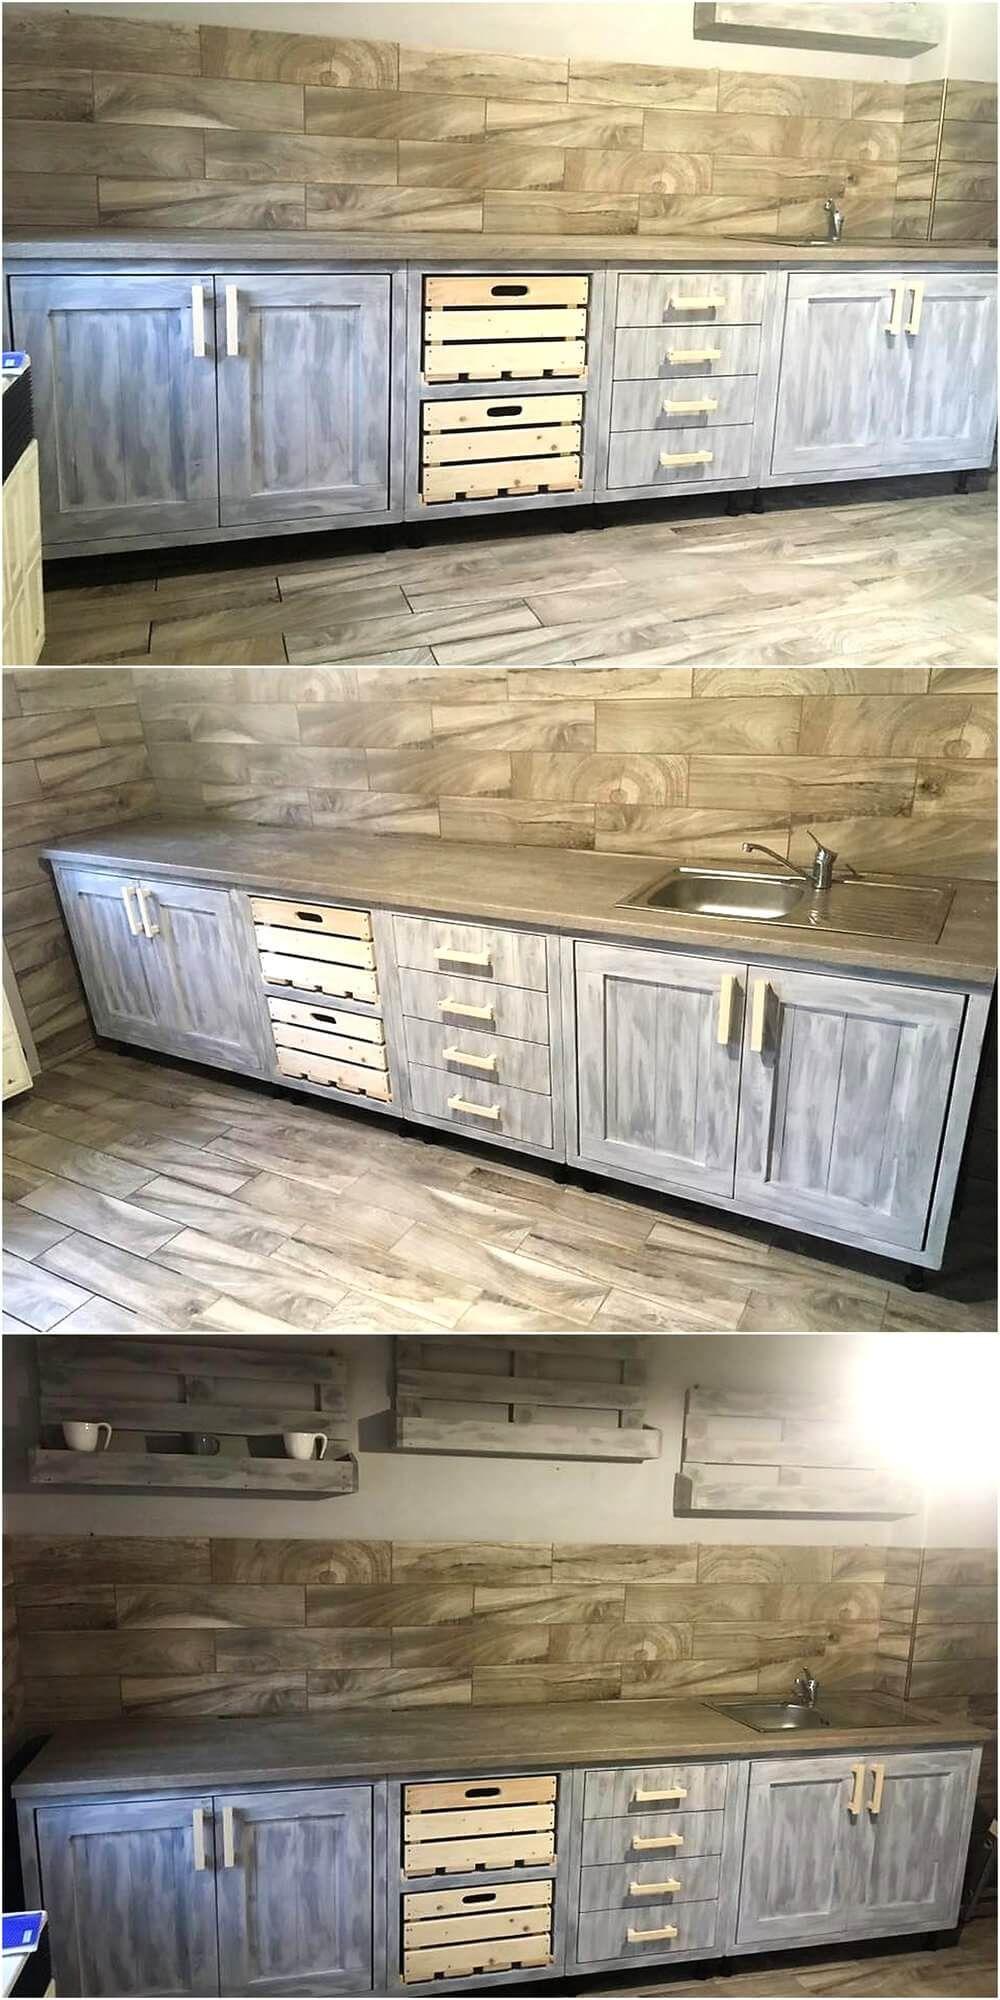 Vintage Style Repurposed Wood Pallets Kitchen Wood Pallet Furniture Pallet Kitchen Cabinets Pallet Kitchen Wood Pallet Projects